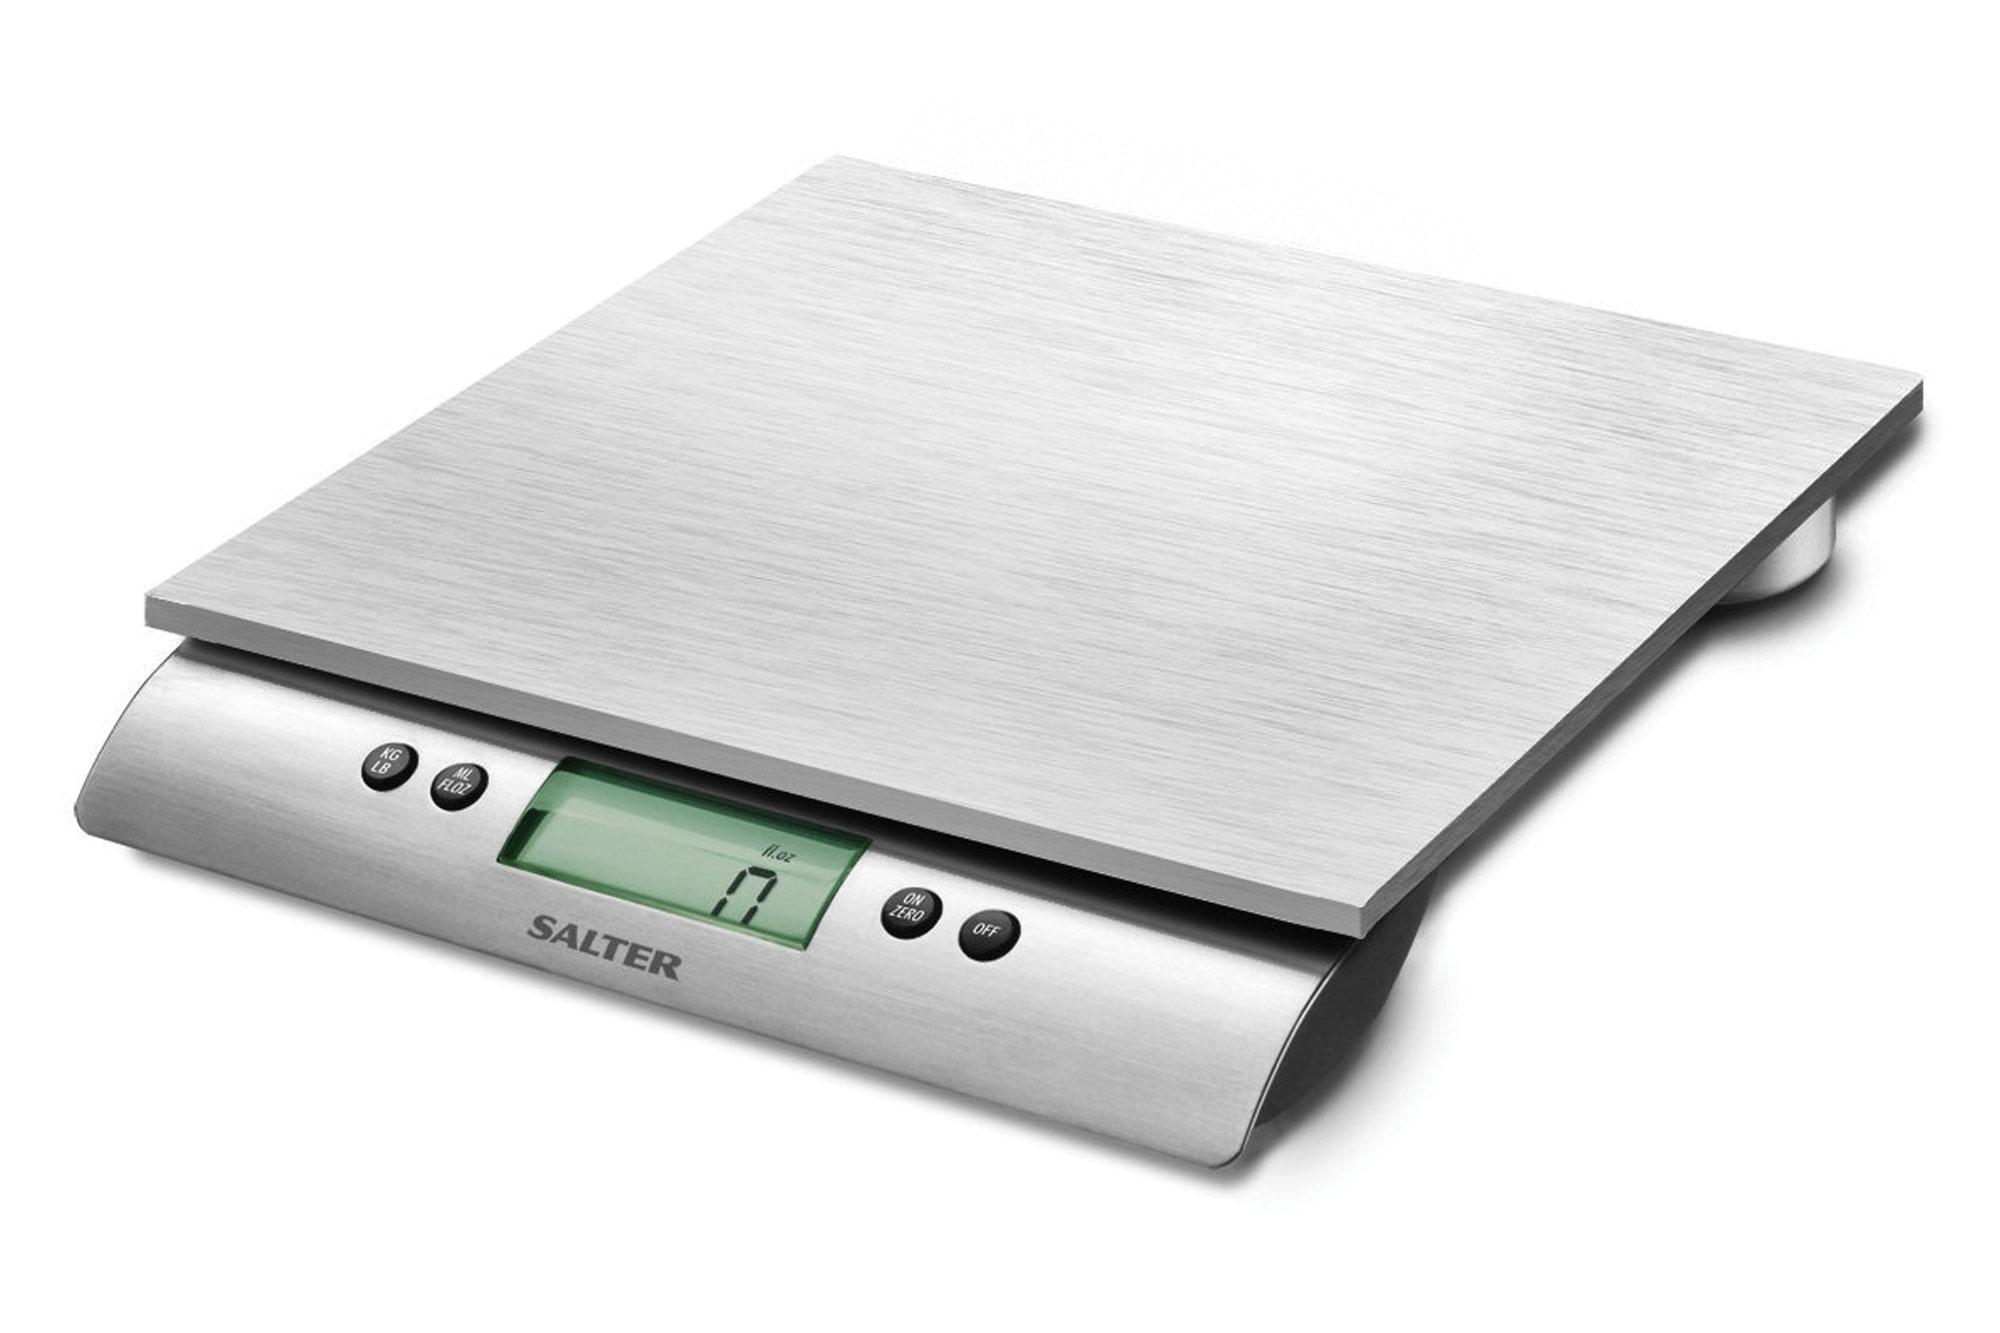 salter digital stainless steel aquatronic kitchen scale. Black Bedroom Furniture Sets. Home Design Ideas